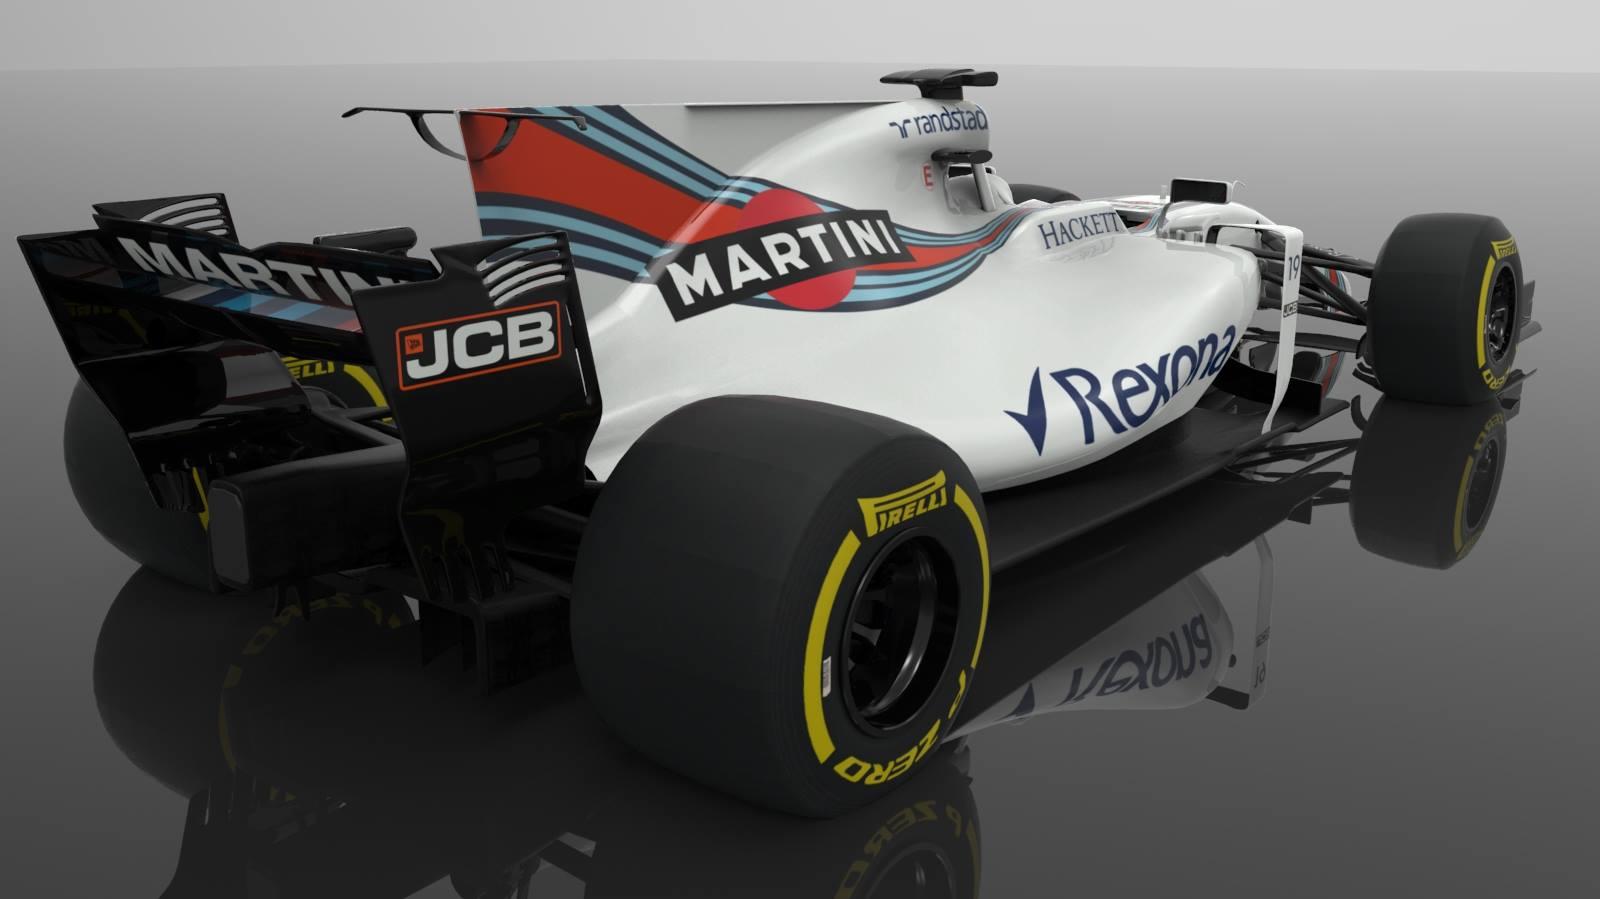 ACFL Williams - Pitlanes Sim Racing